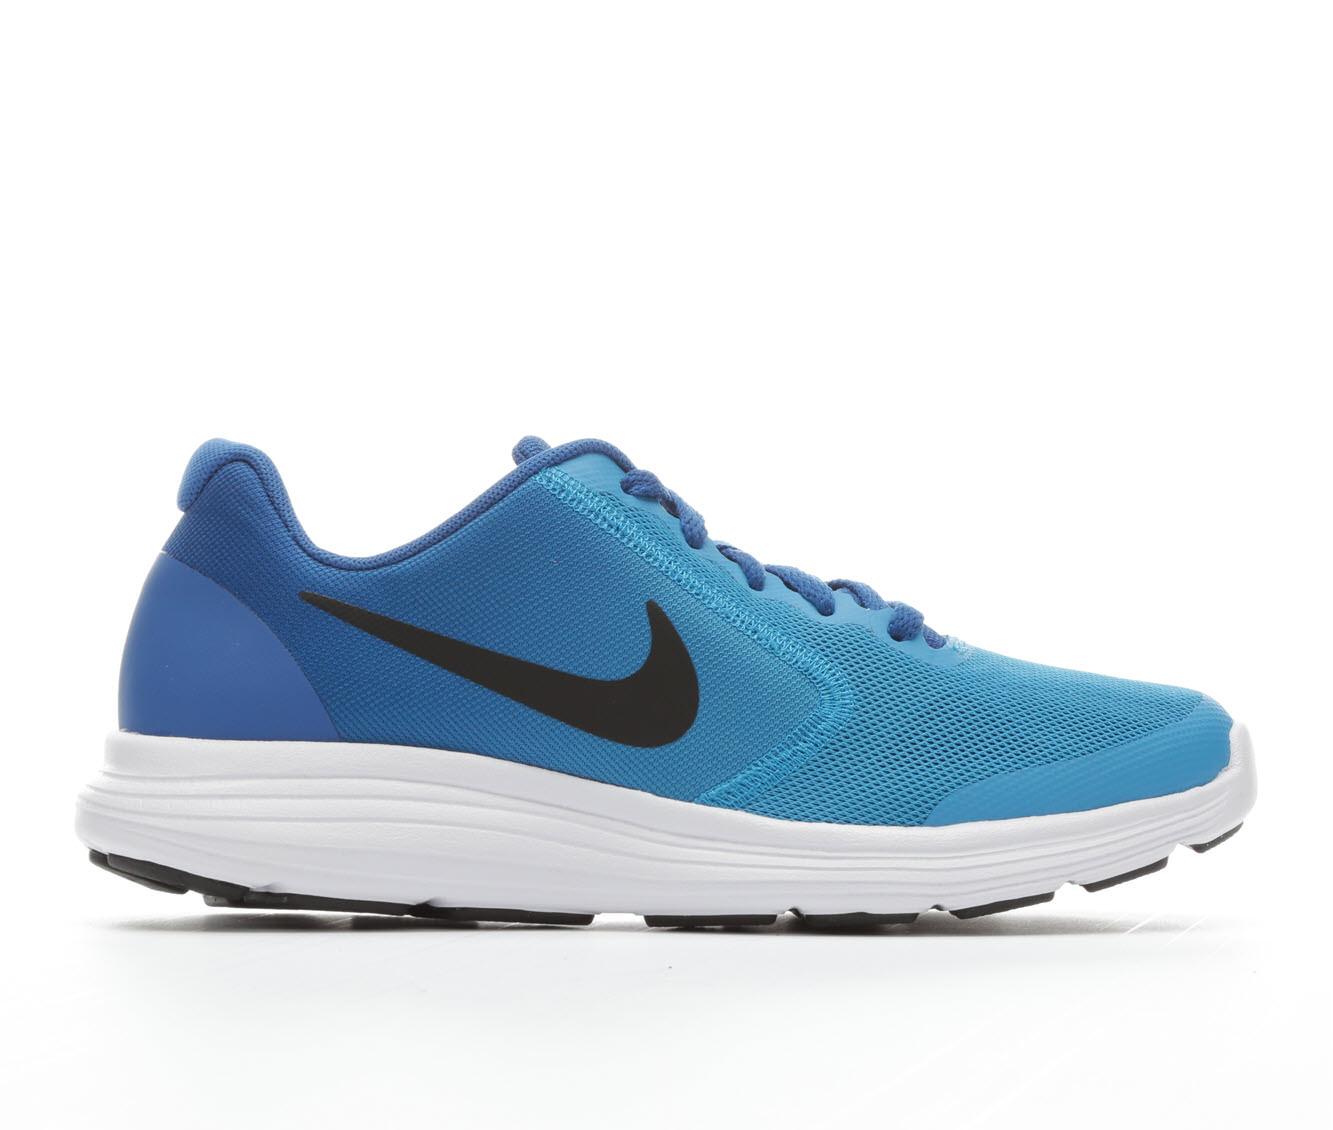 Boys' Nike Revolution 3 Athletic Shoes (Blue)